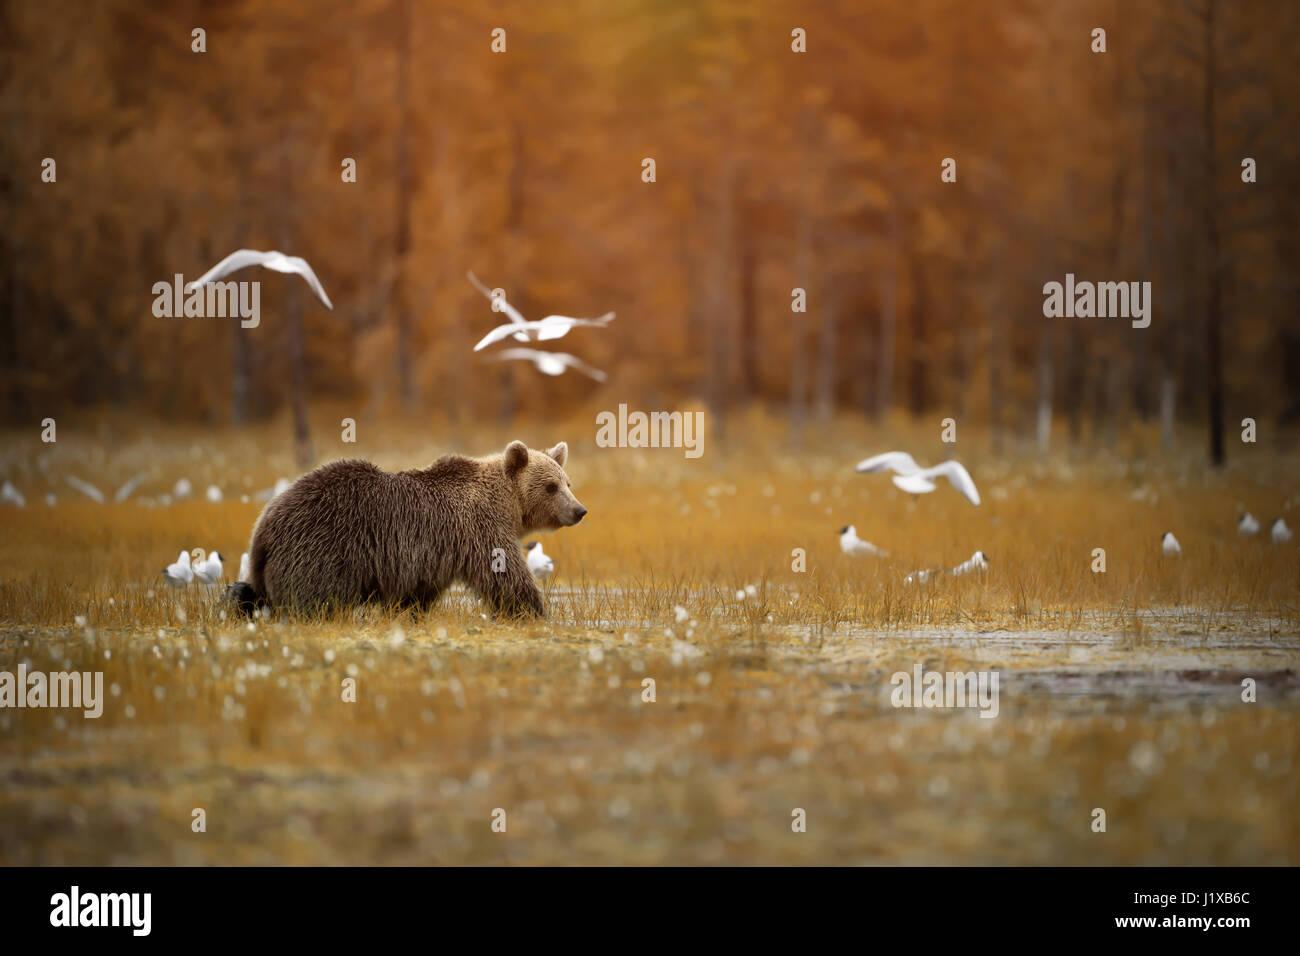 Brown bear crossing the swamp - Stock Image